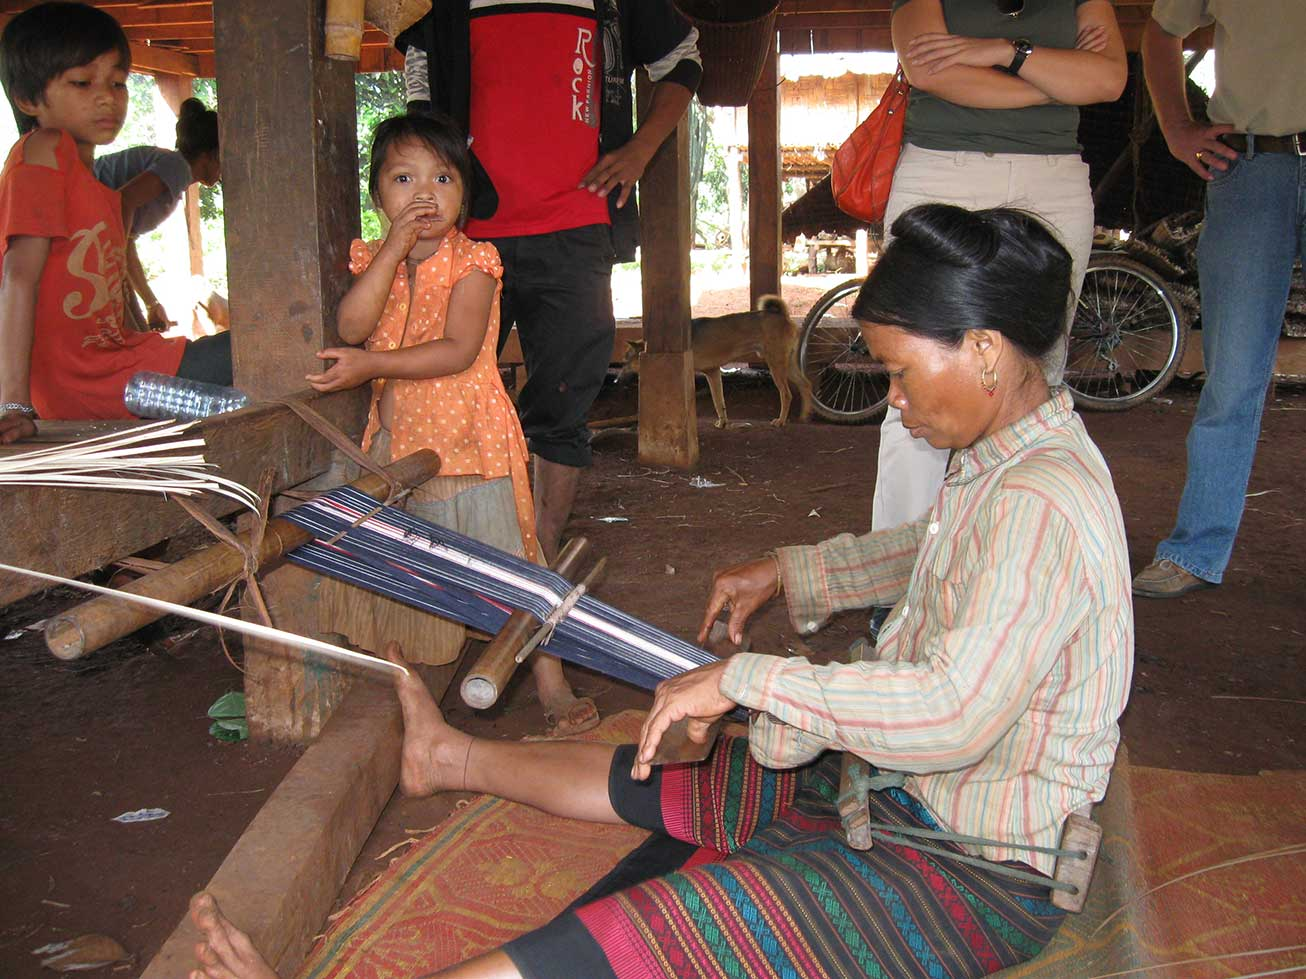 Tejido textil en Ratanakiri